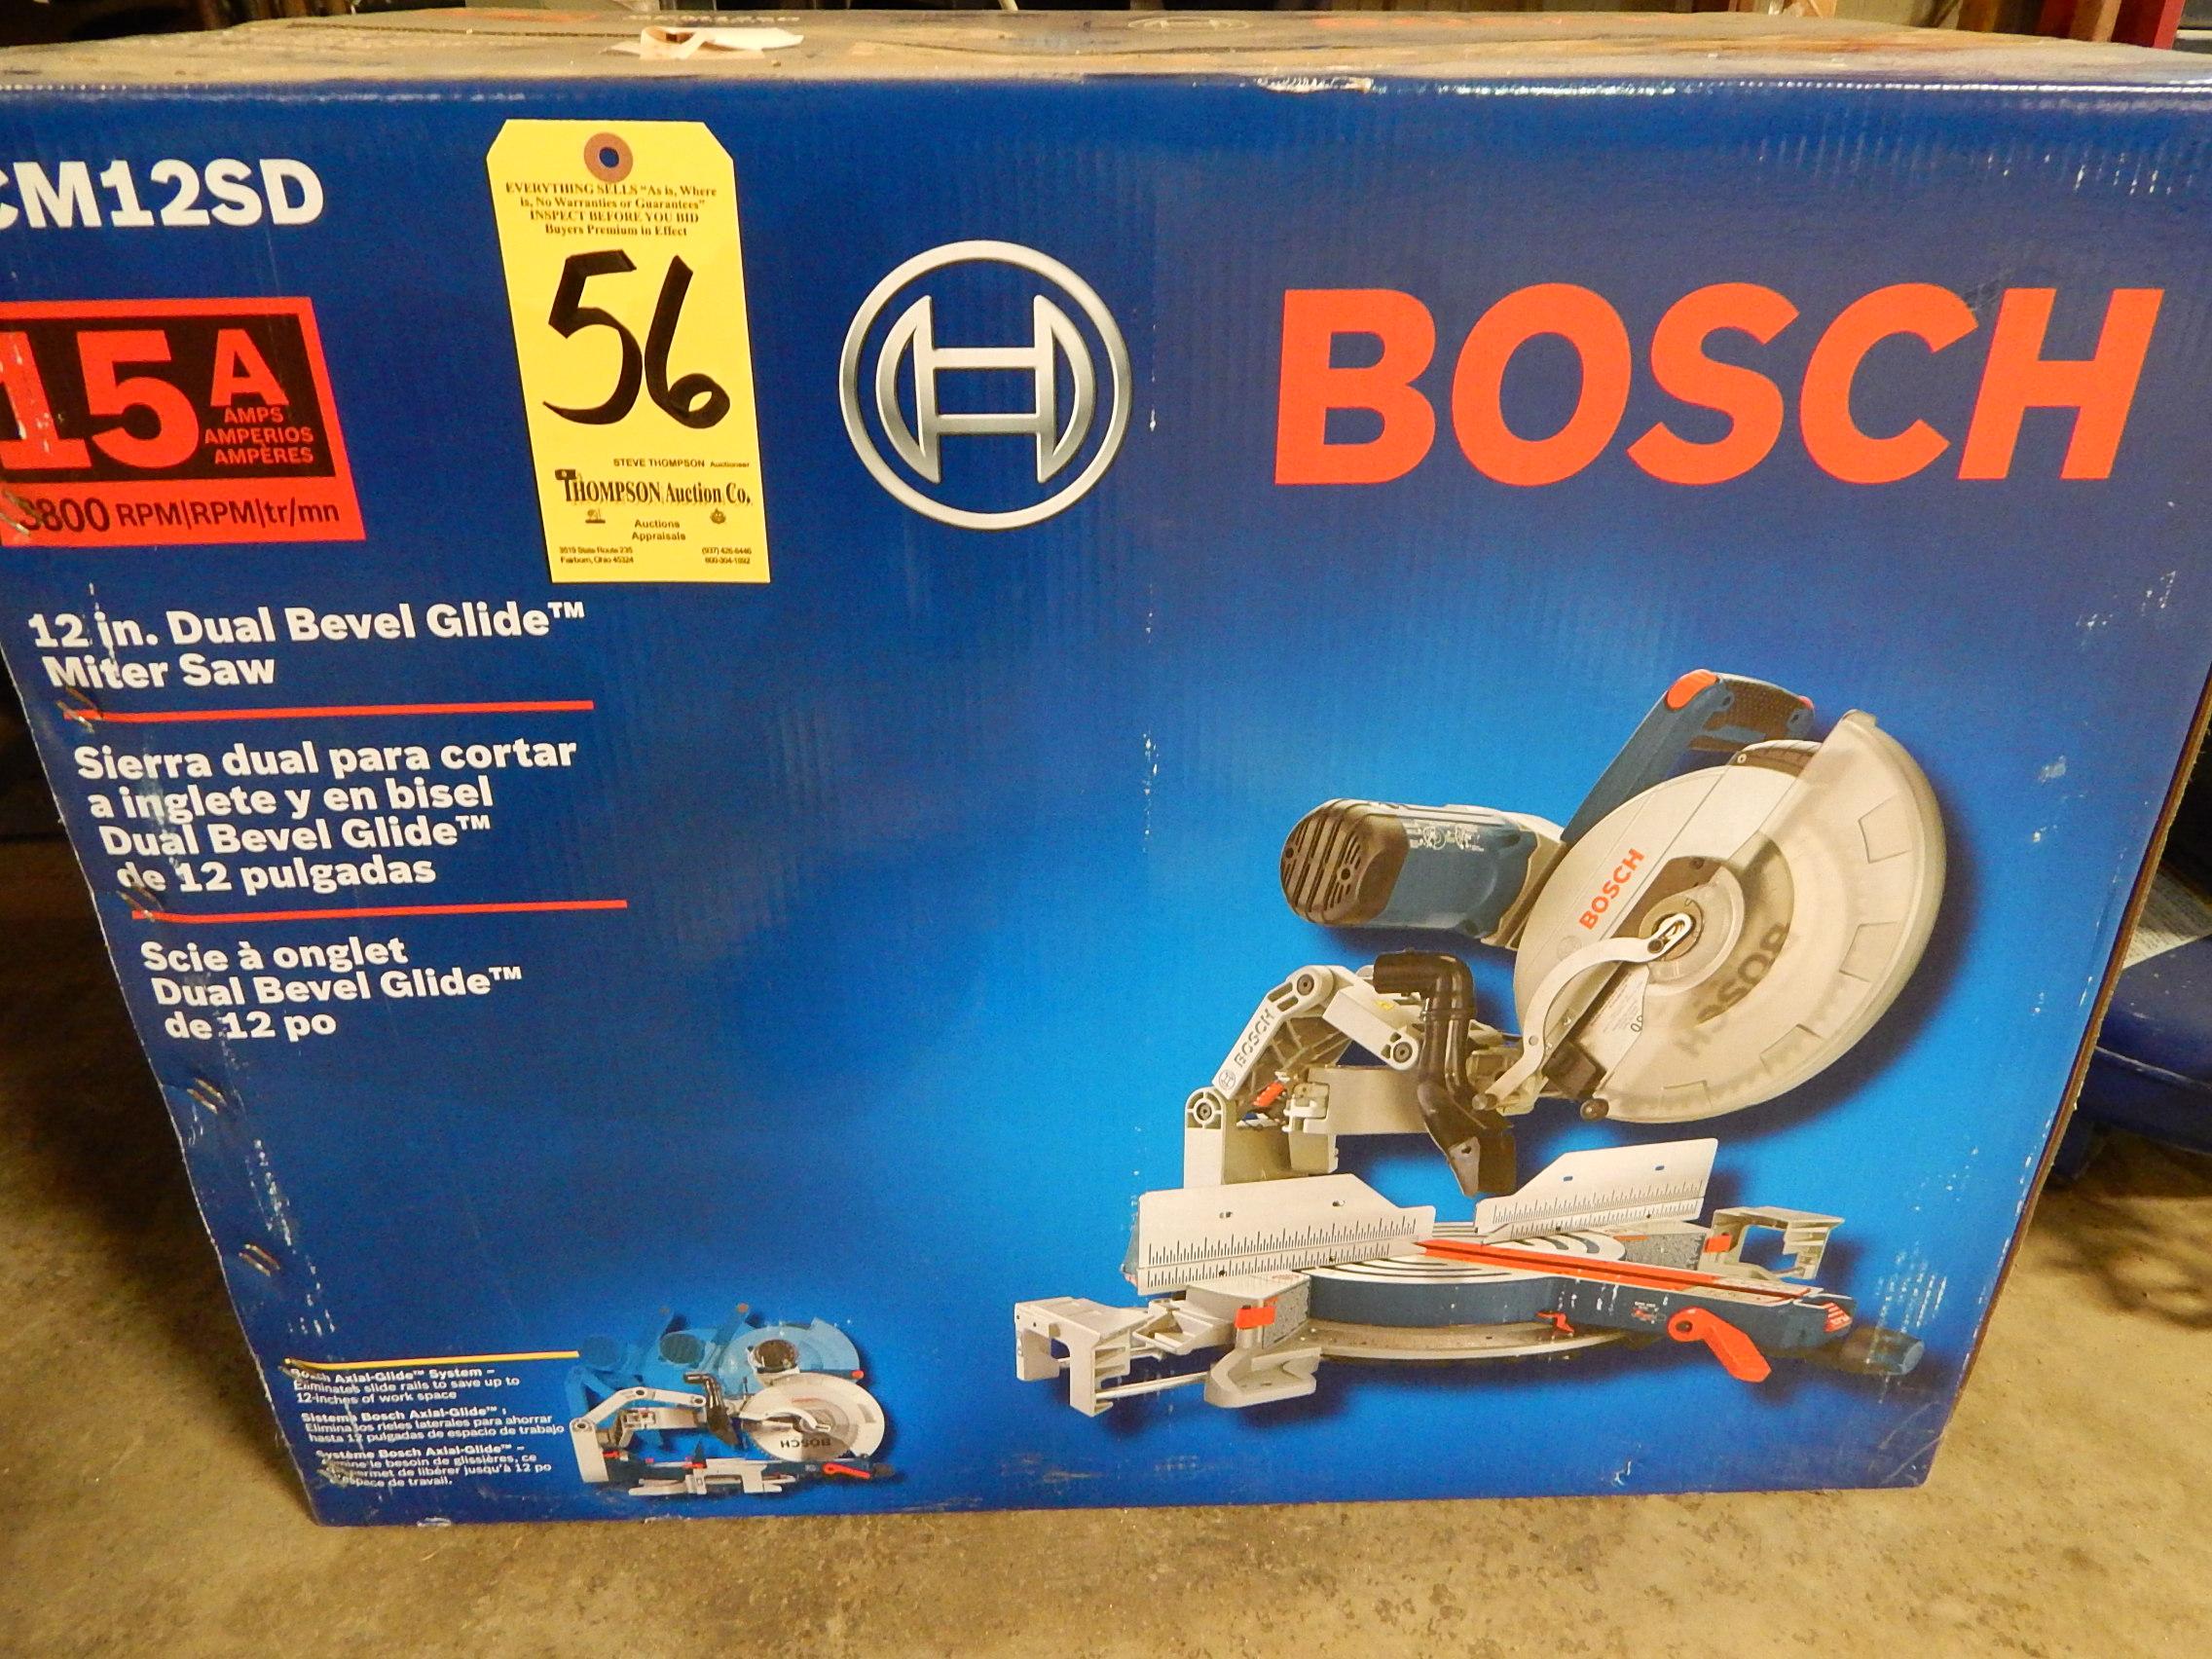 "Lot 56 - Bosch GCM125D 12"" Dual Bevel Glide Miter Saw, New in Box"